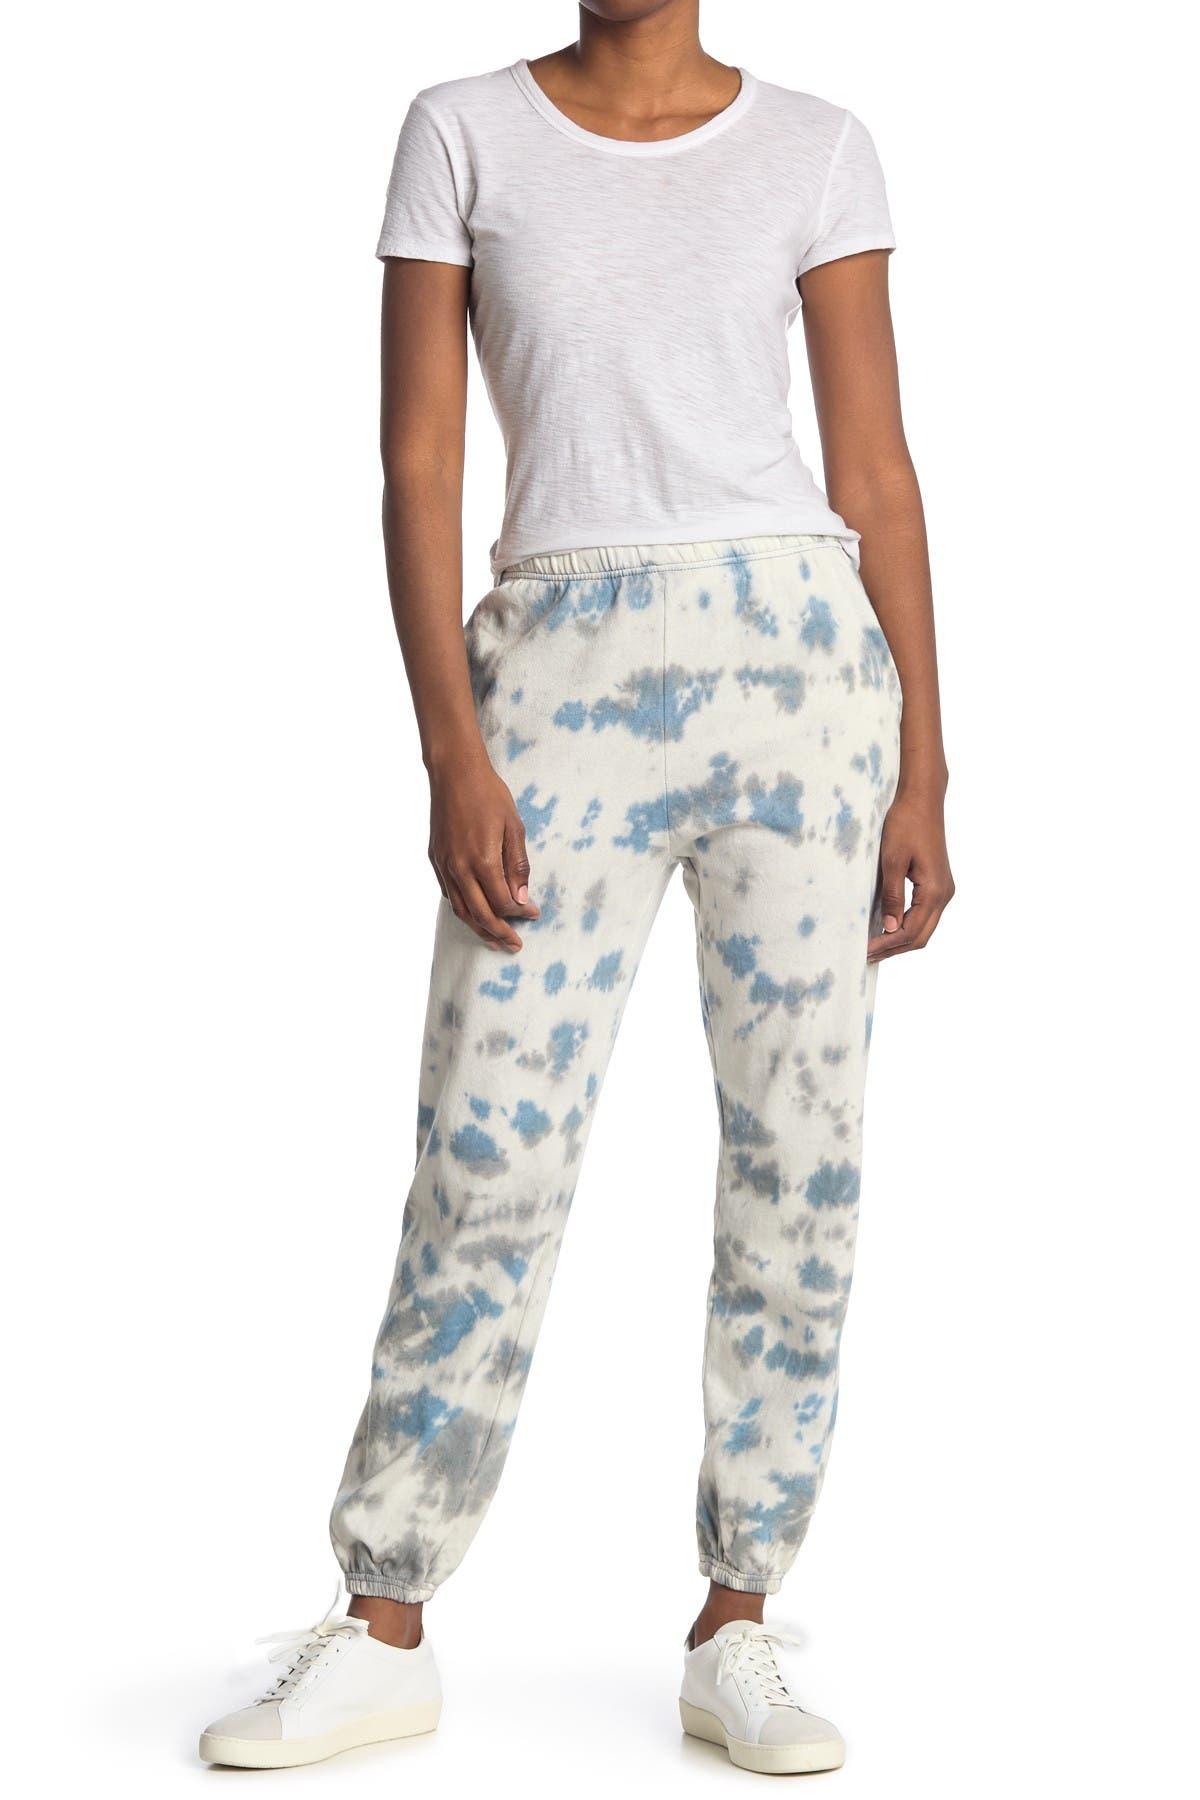 Image of Threads 4 Thought Boyfriend Tie-Dye Organic Cotton Blend Sweatpants